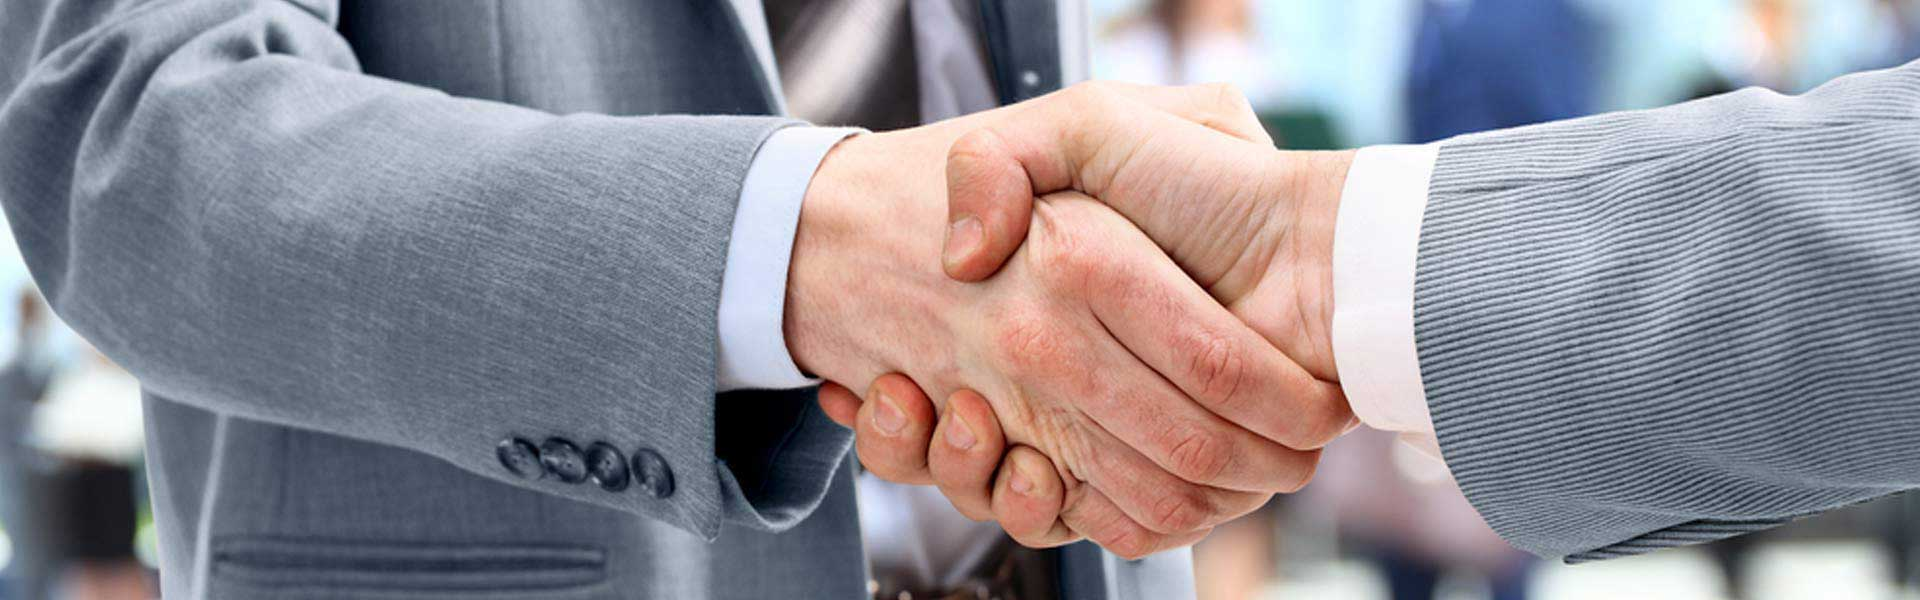 businessmen-shaking-hands